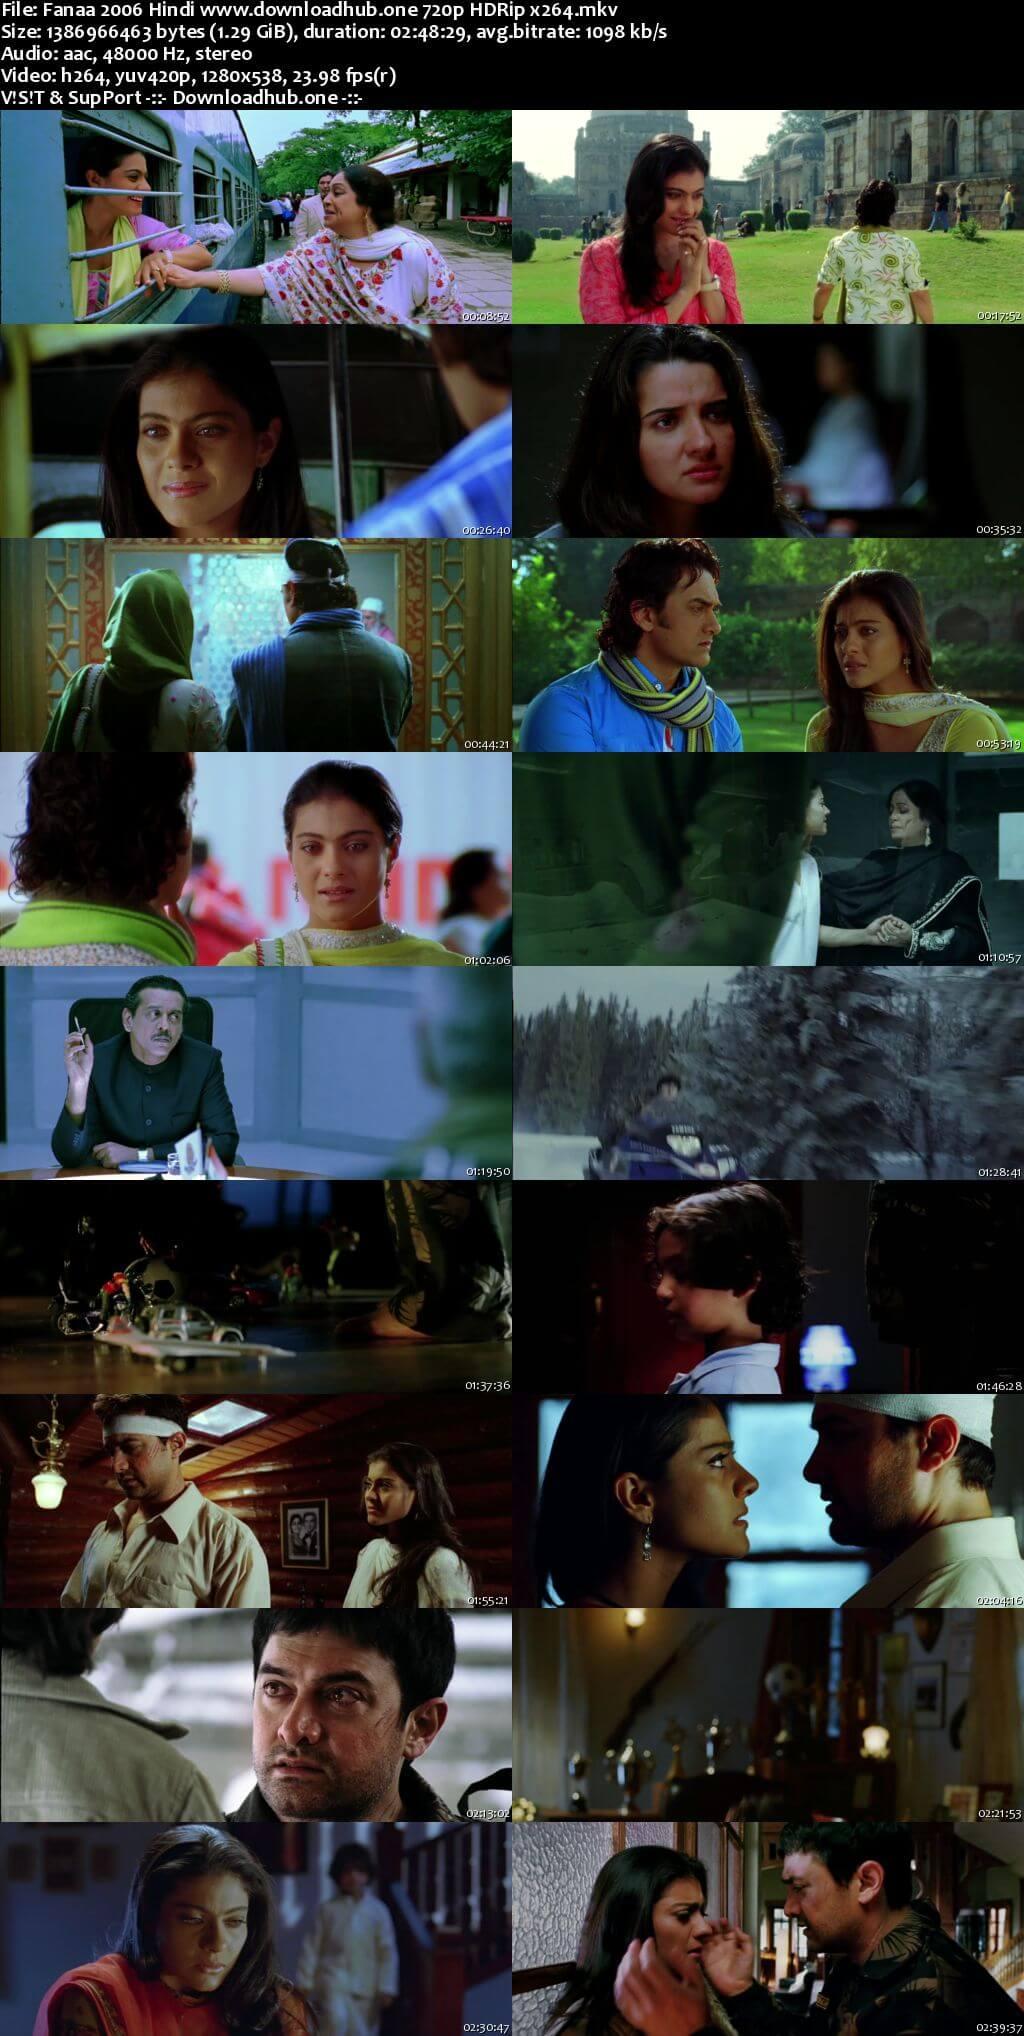 Fanaa 2006 Hindi 720p HDRip x264